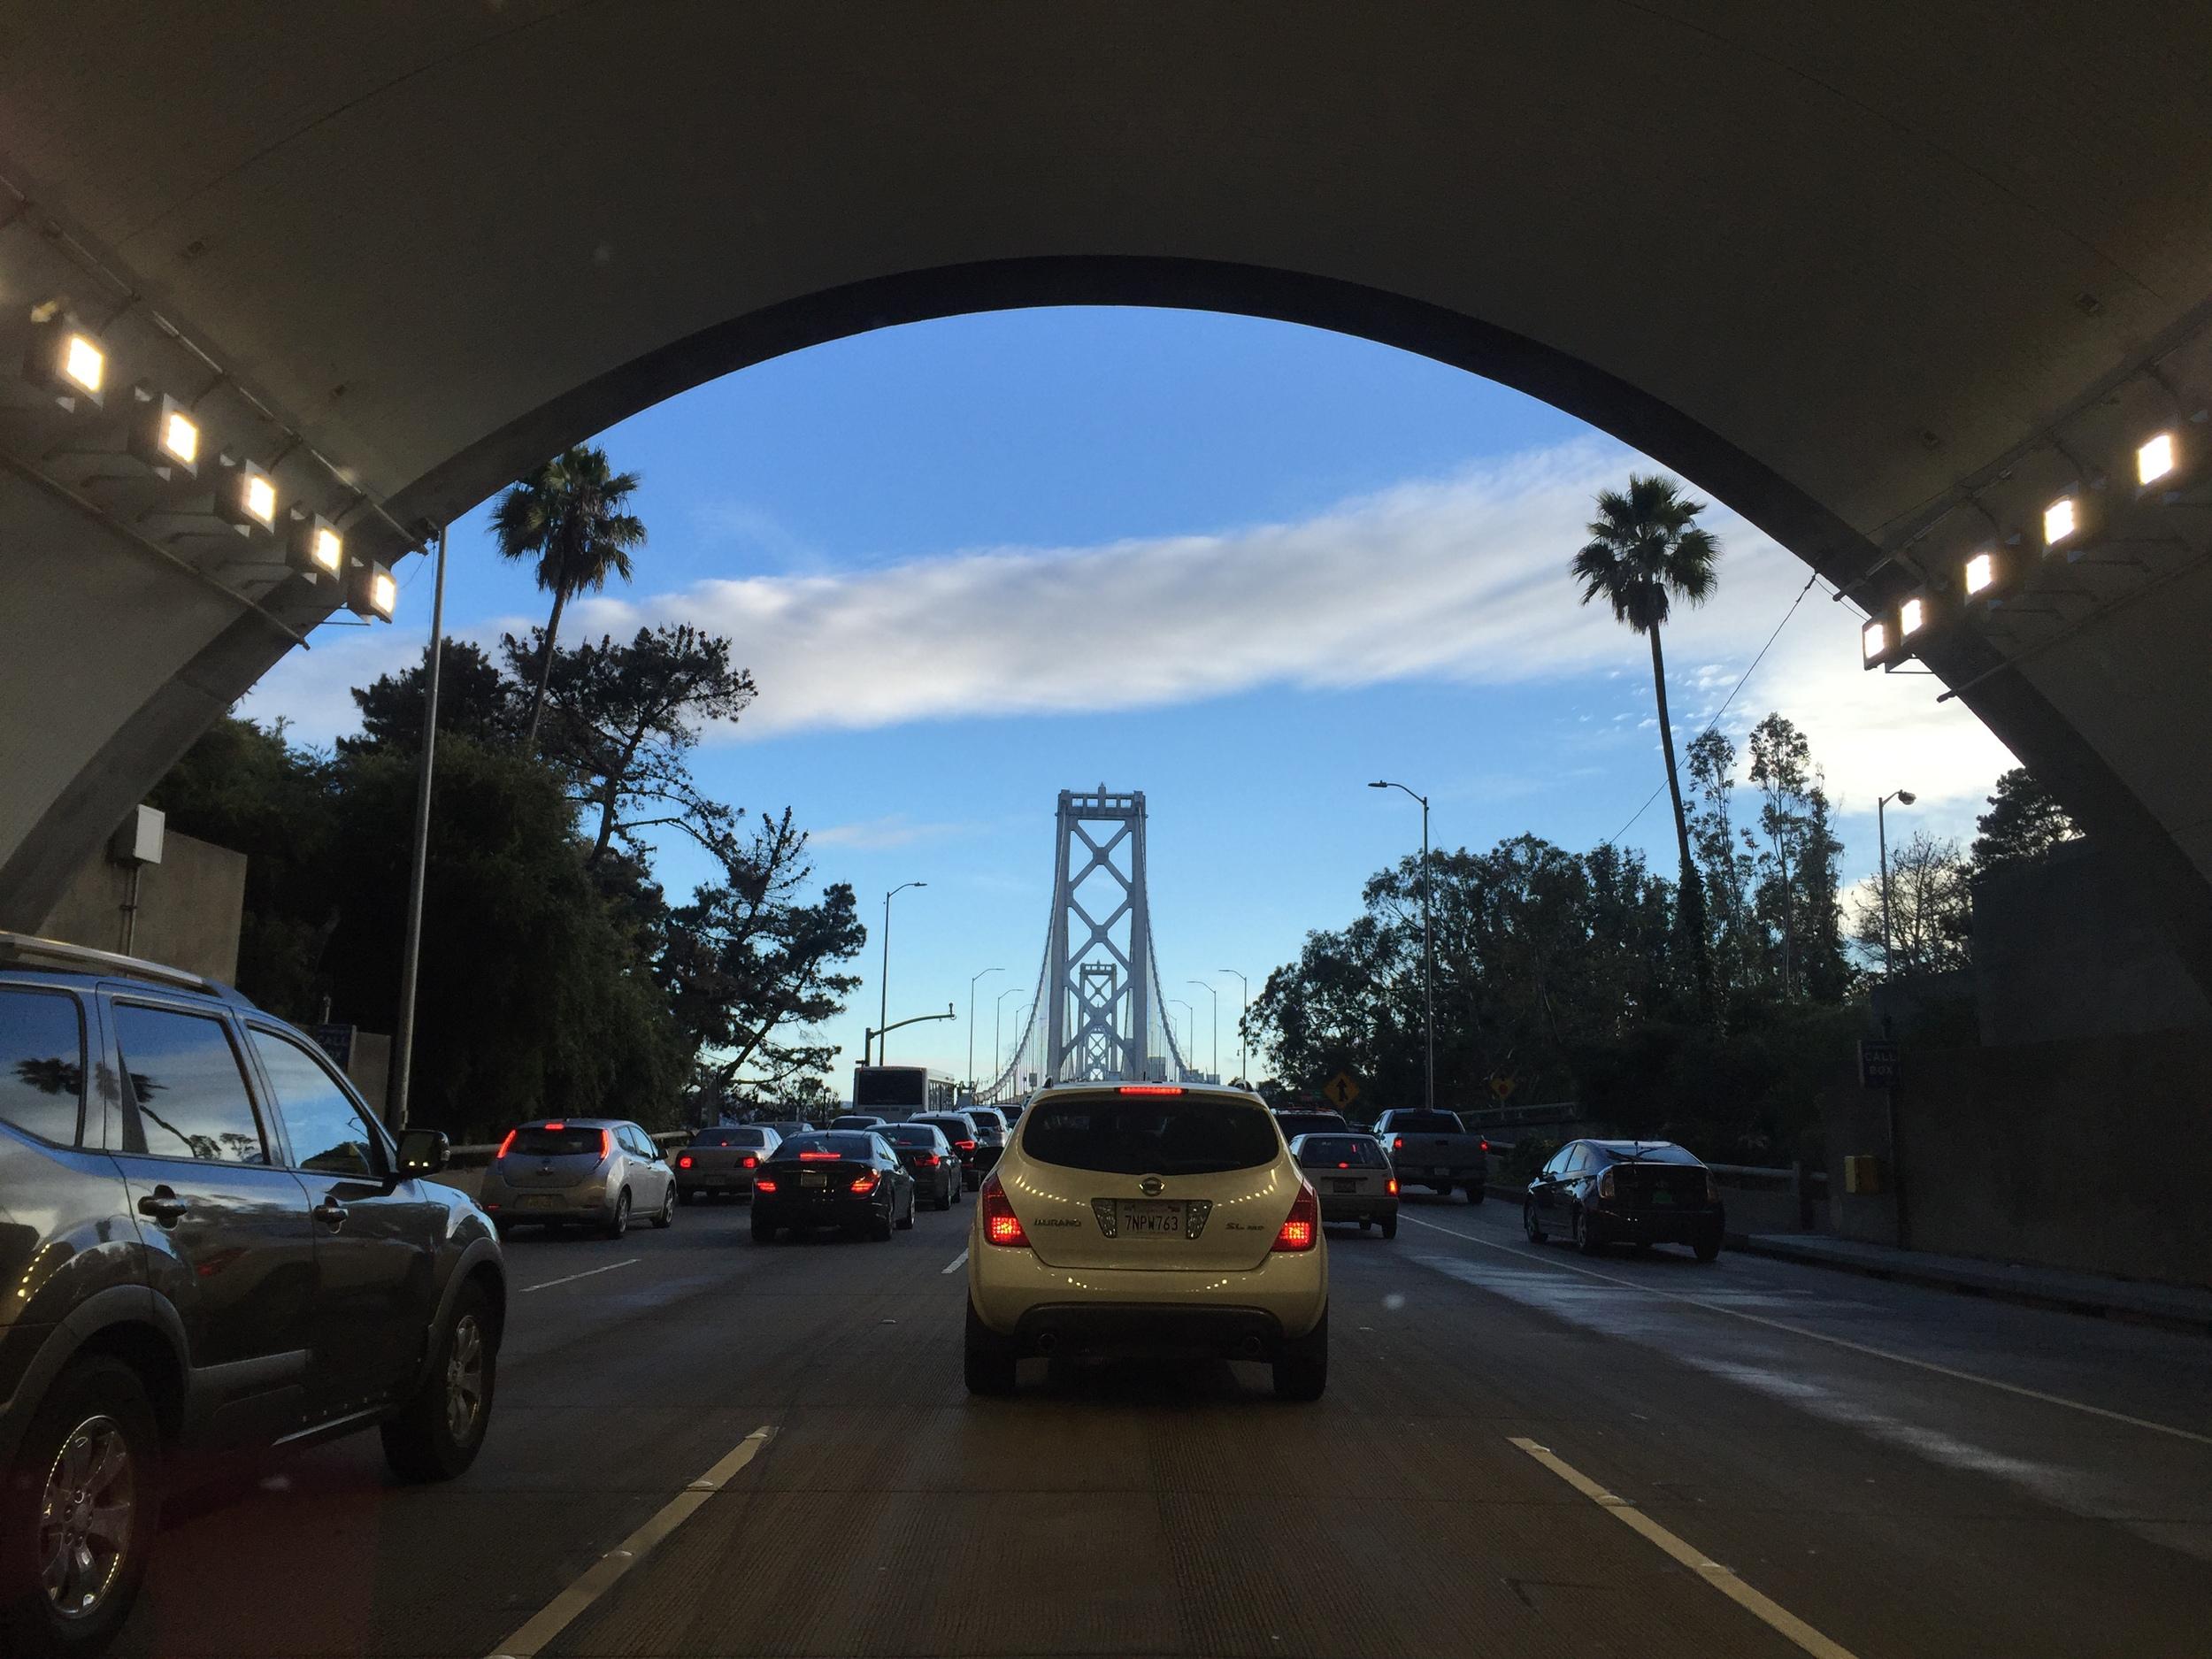 Heading west back to San Francisco through the Yerba Buena Island tunnel.